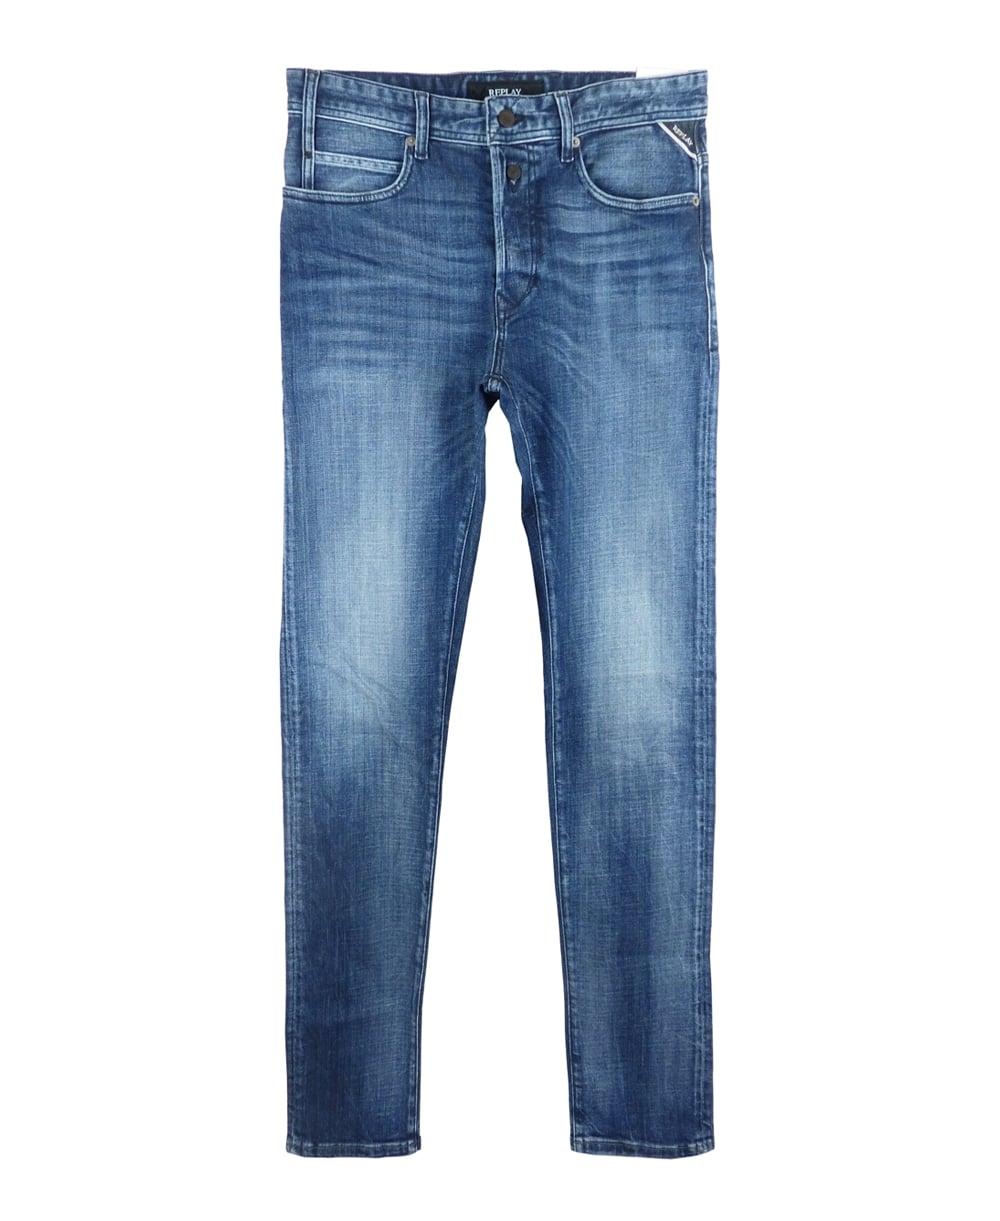 tapered fit jeans in blue. Black Bedroom Furniture Sets. Home Design Ideas